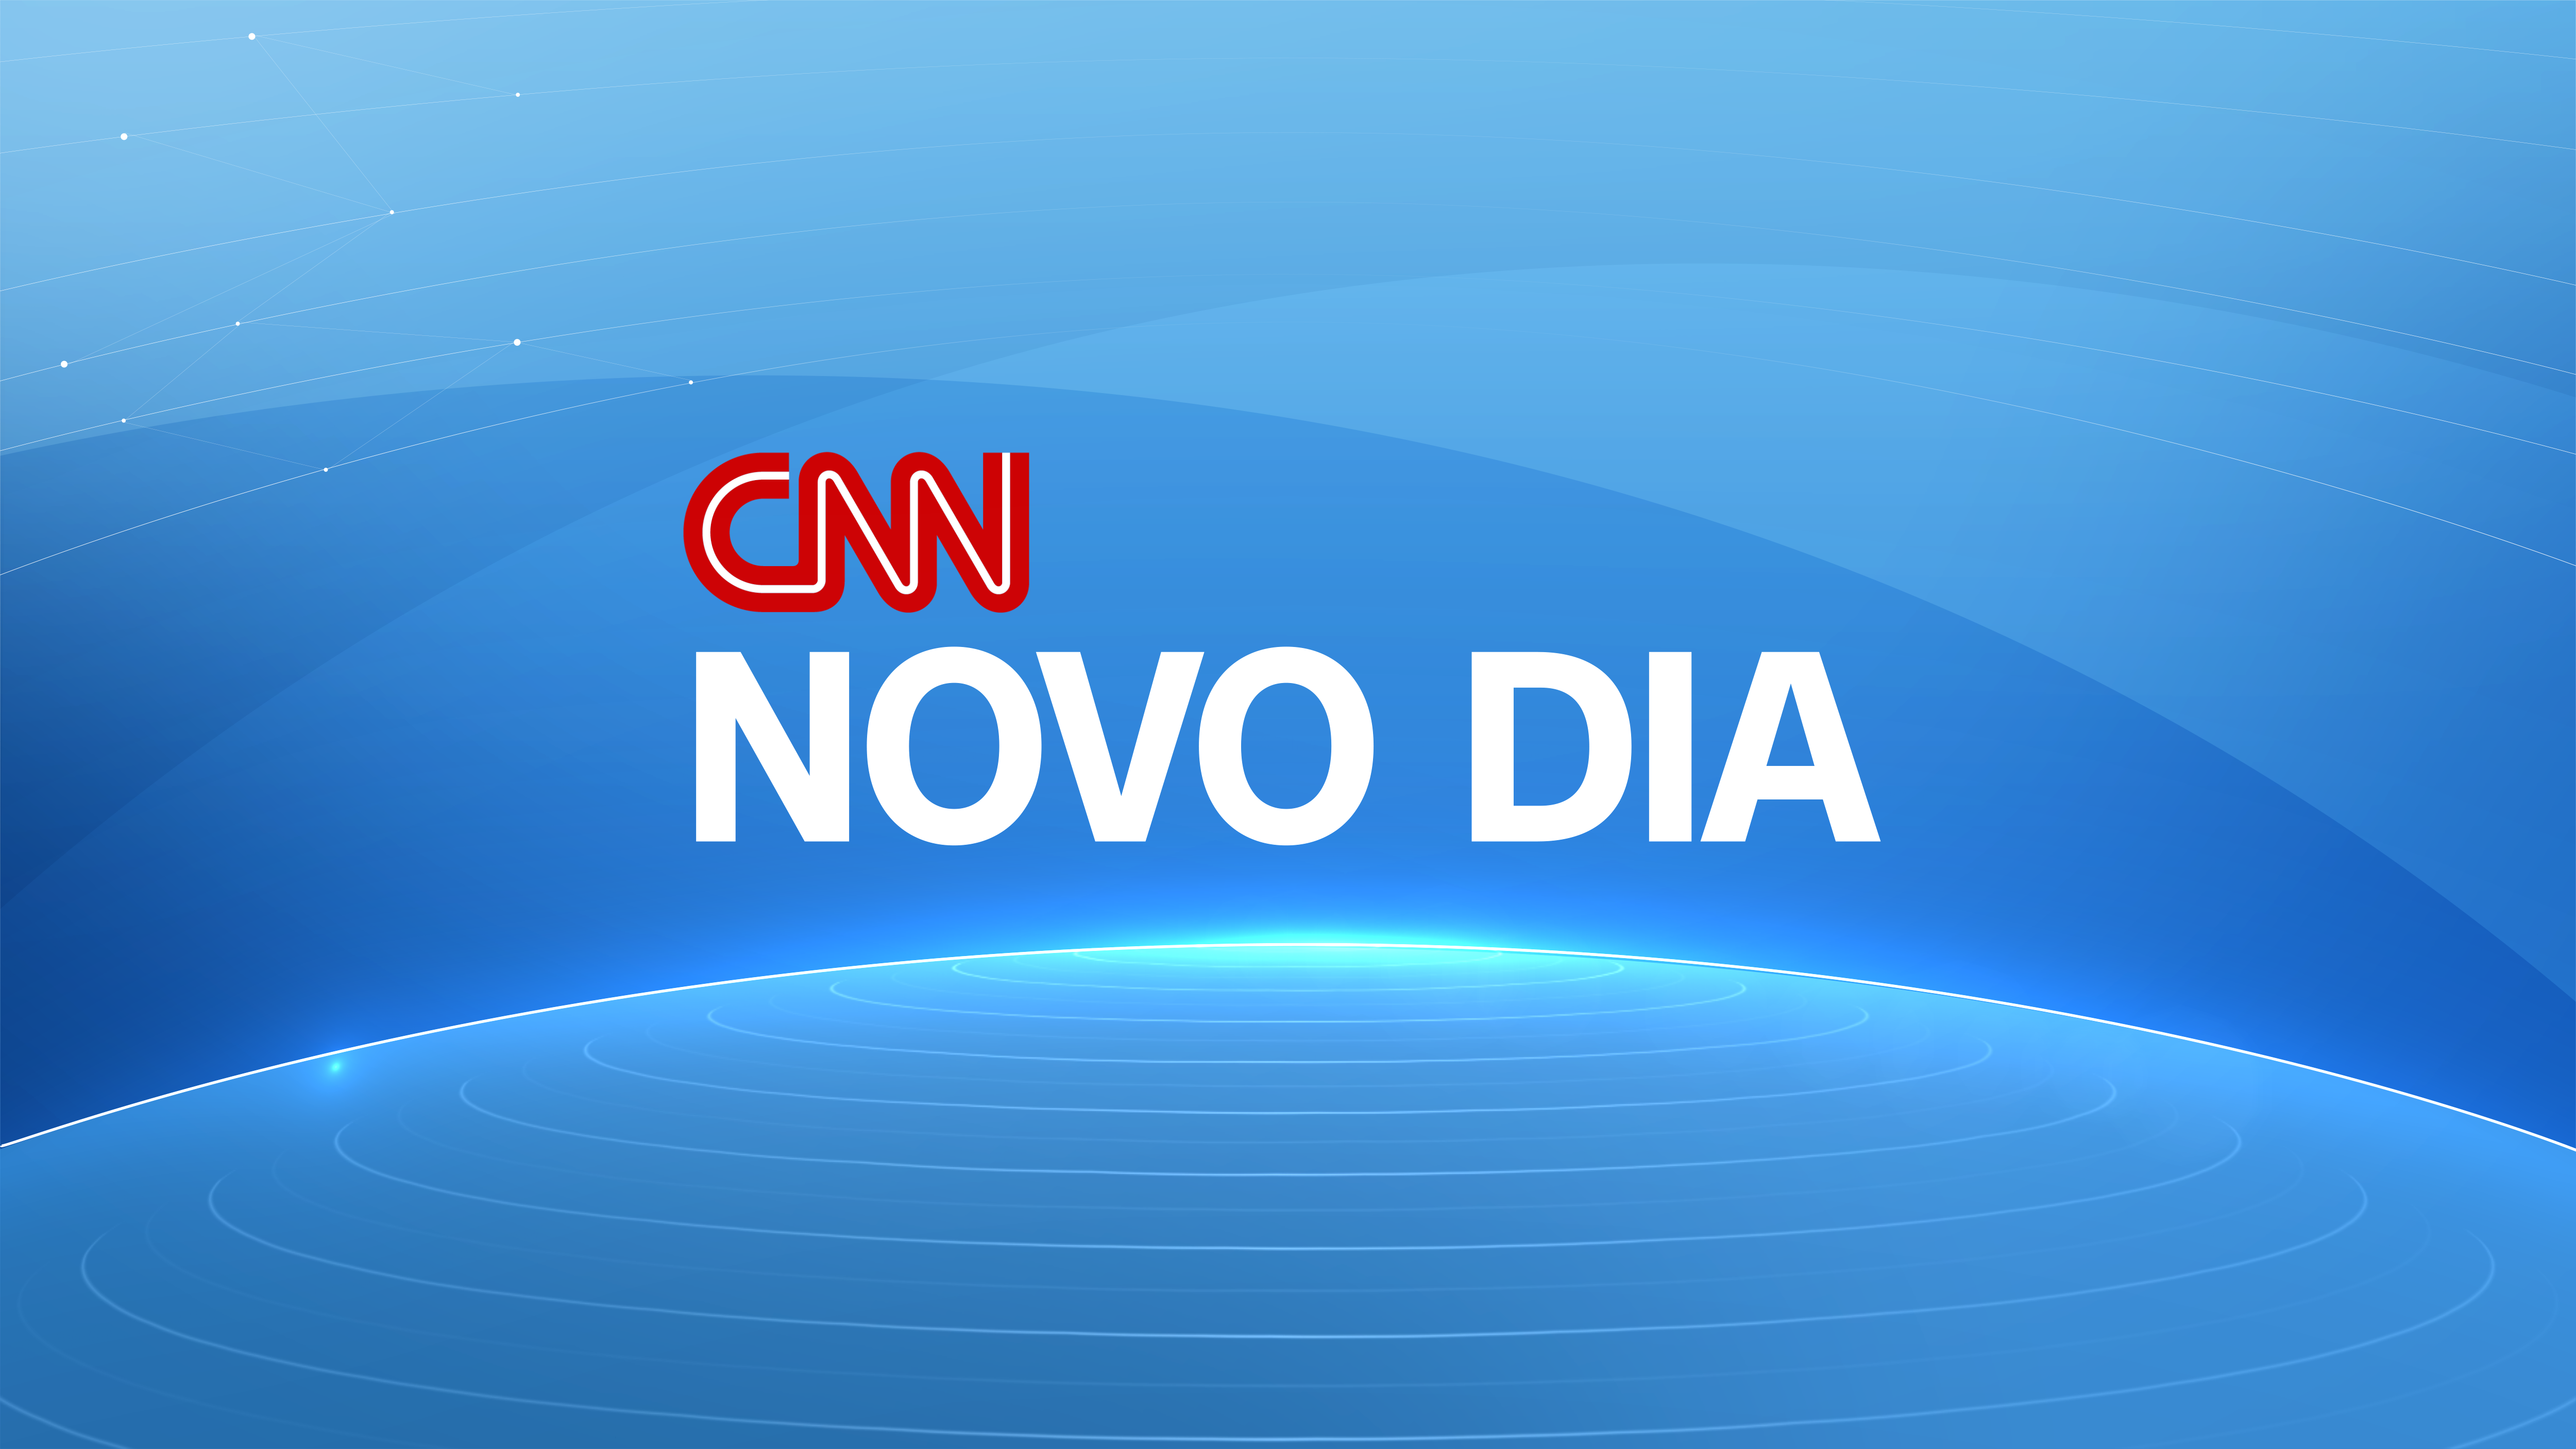 CNN Novo Dia